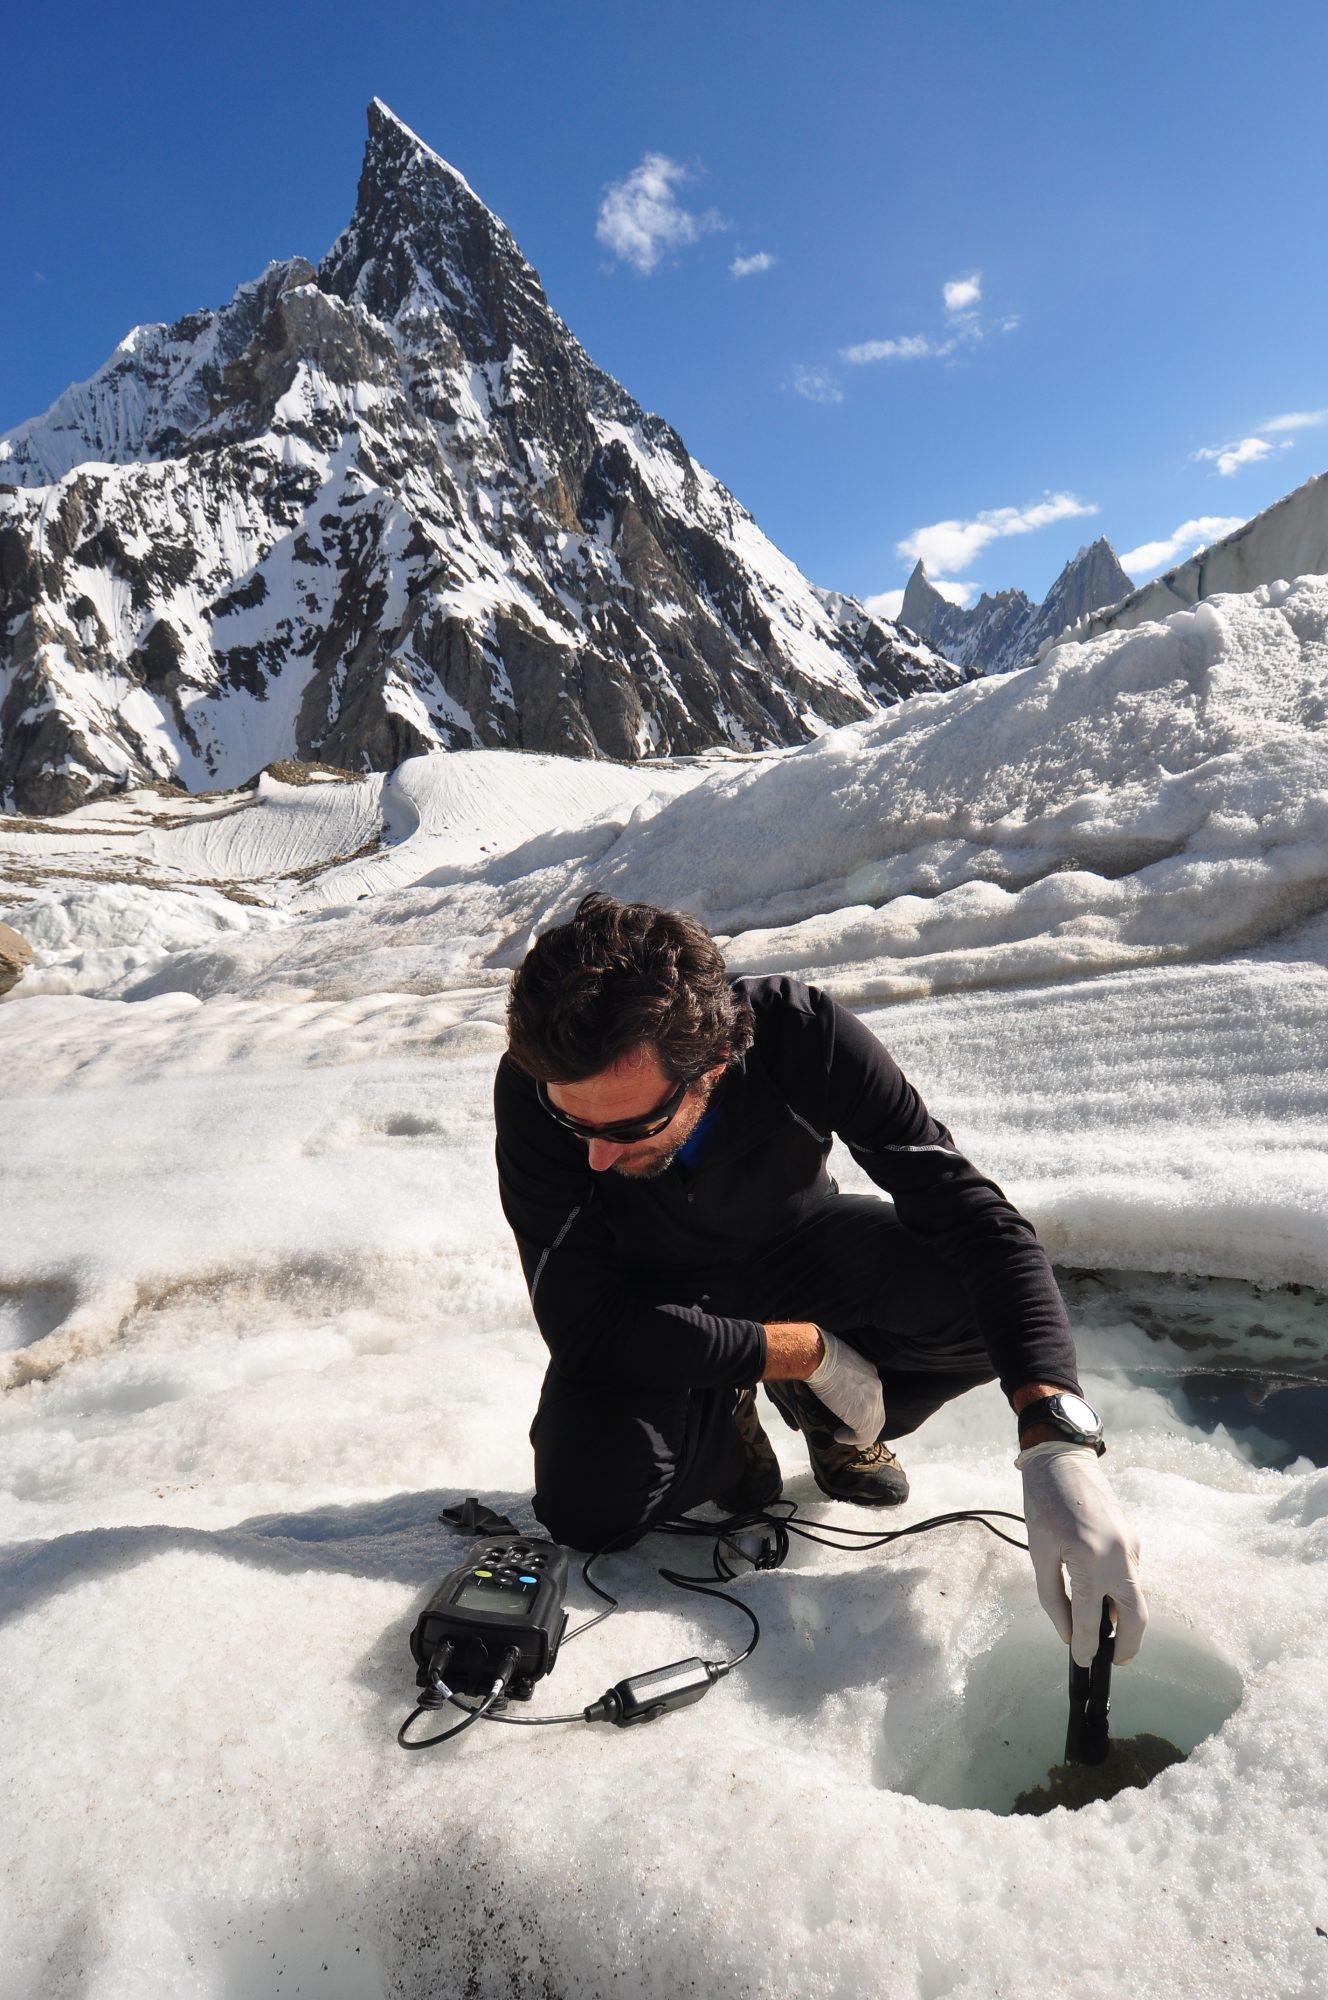 Dr. Roberto Ambrosini taking measurements in cryoconite hole on Baltoro Glacier with Mitre Peak in the background.